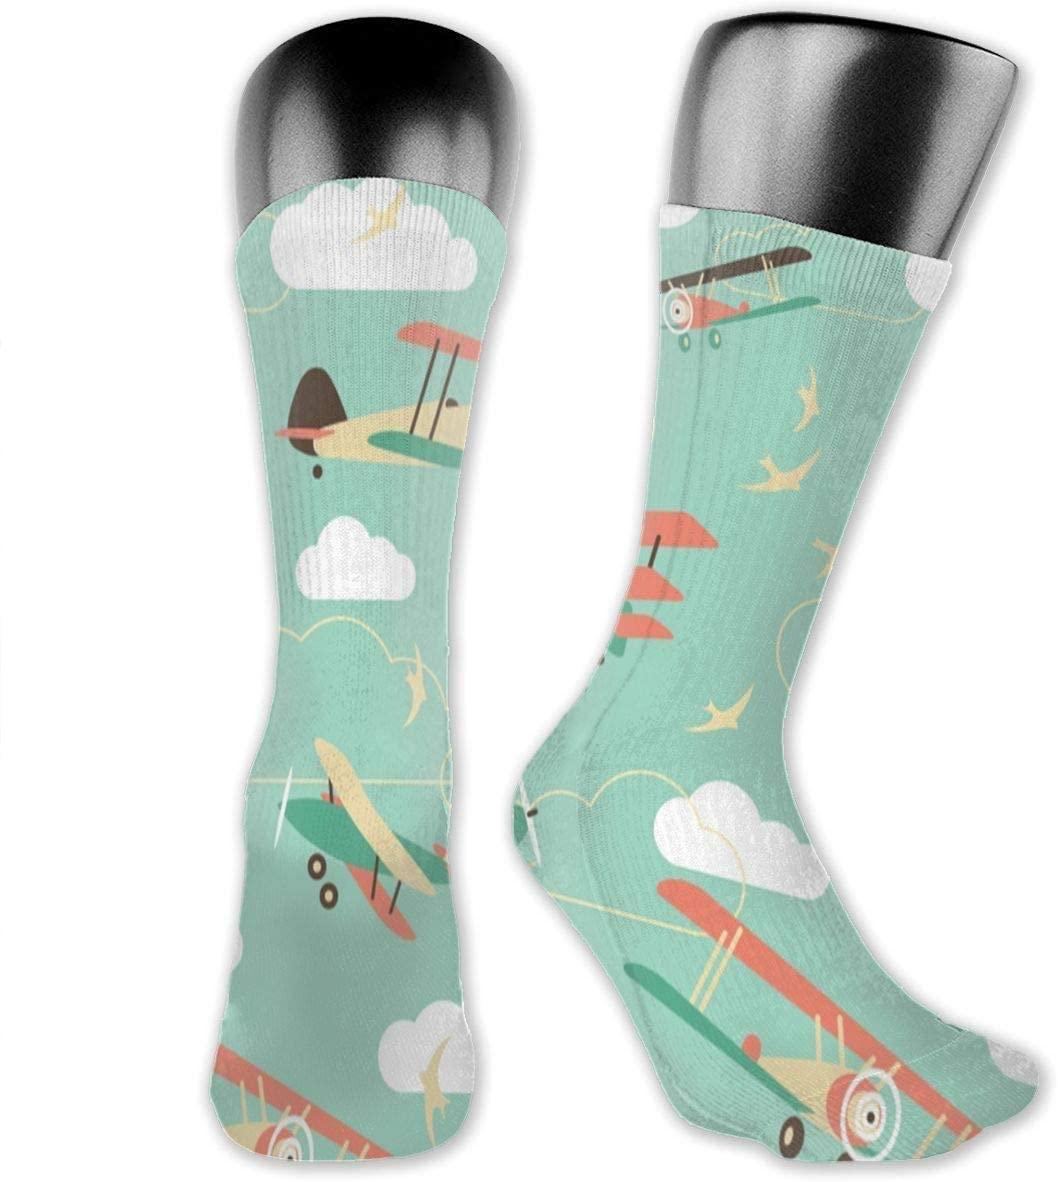 Cartoon Plane Unisex Outdoor Long Socks Sport Athletic Crew Socks Stockings